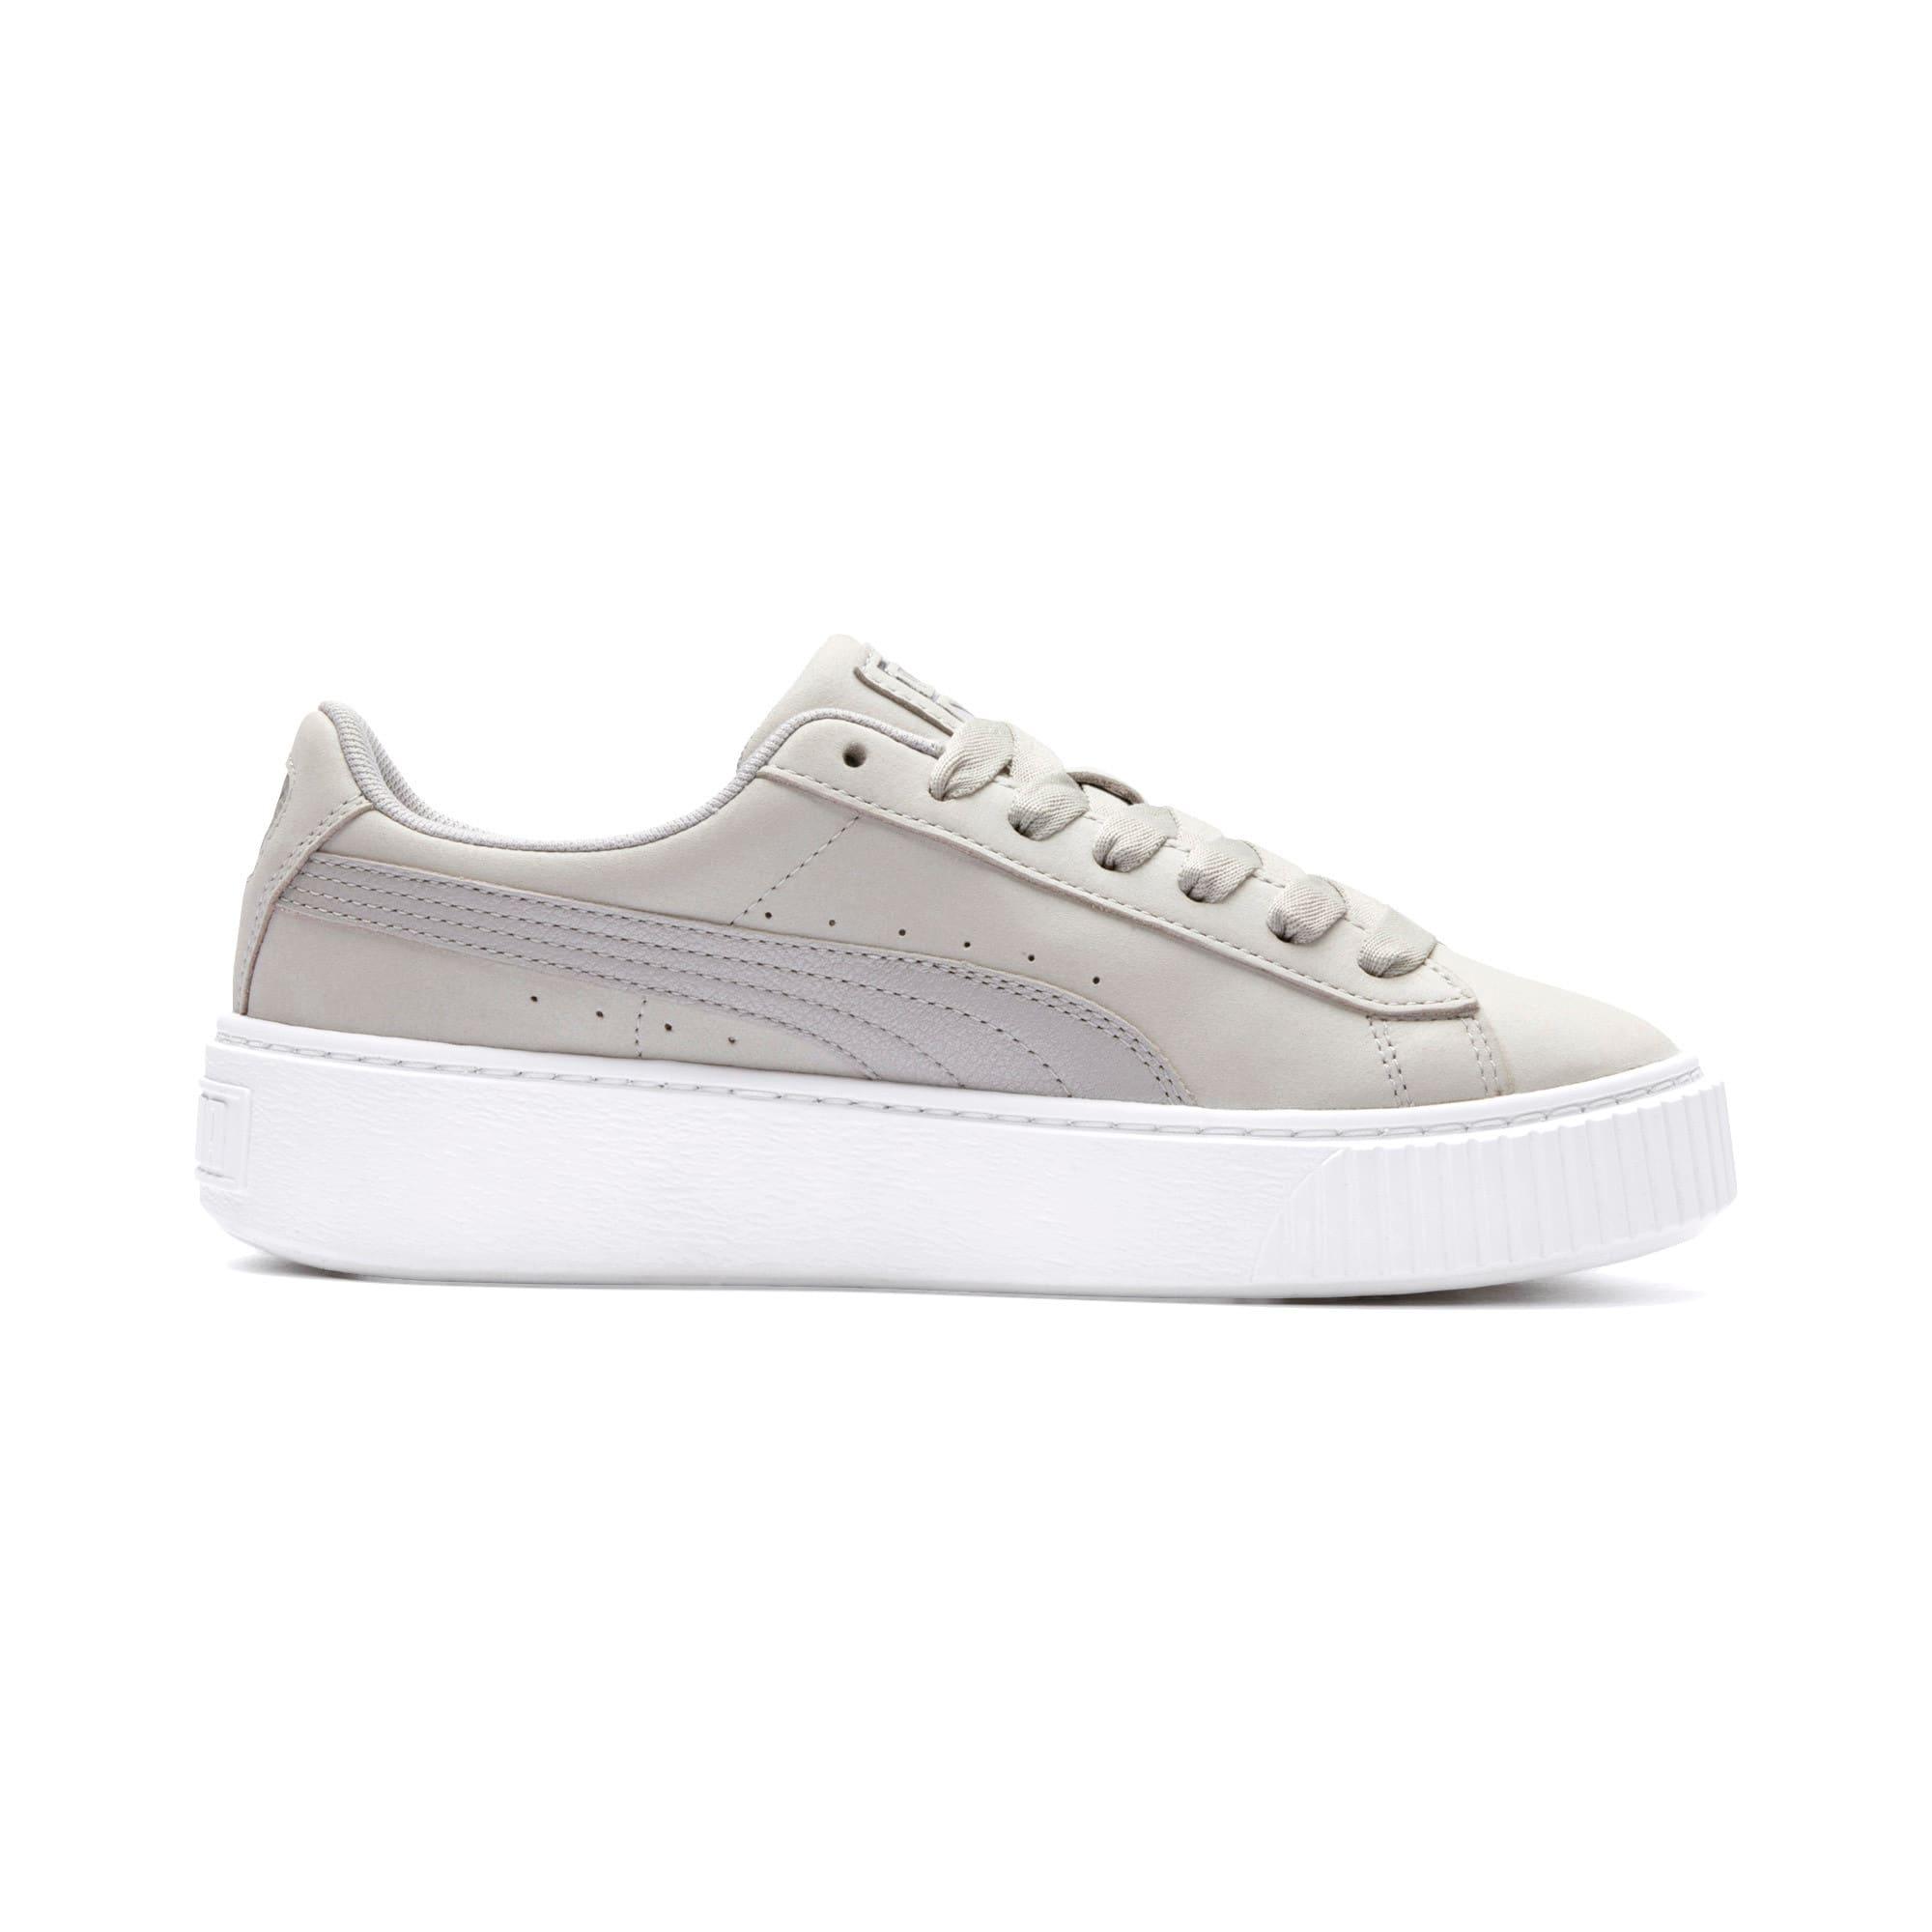 Thumbnail 6 of Suede Platform Shimmer Women's Sneakers, Gray Violet-Puma White, medium